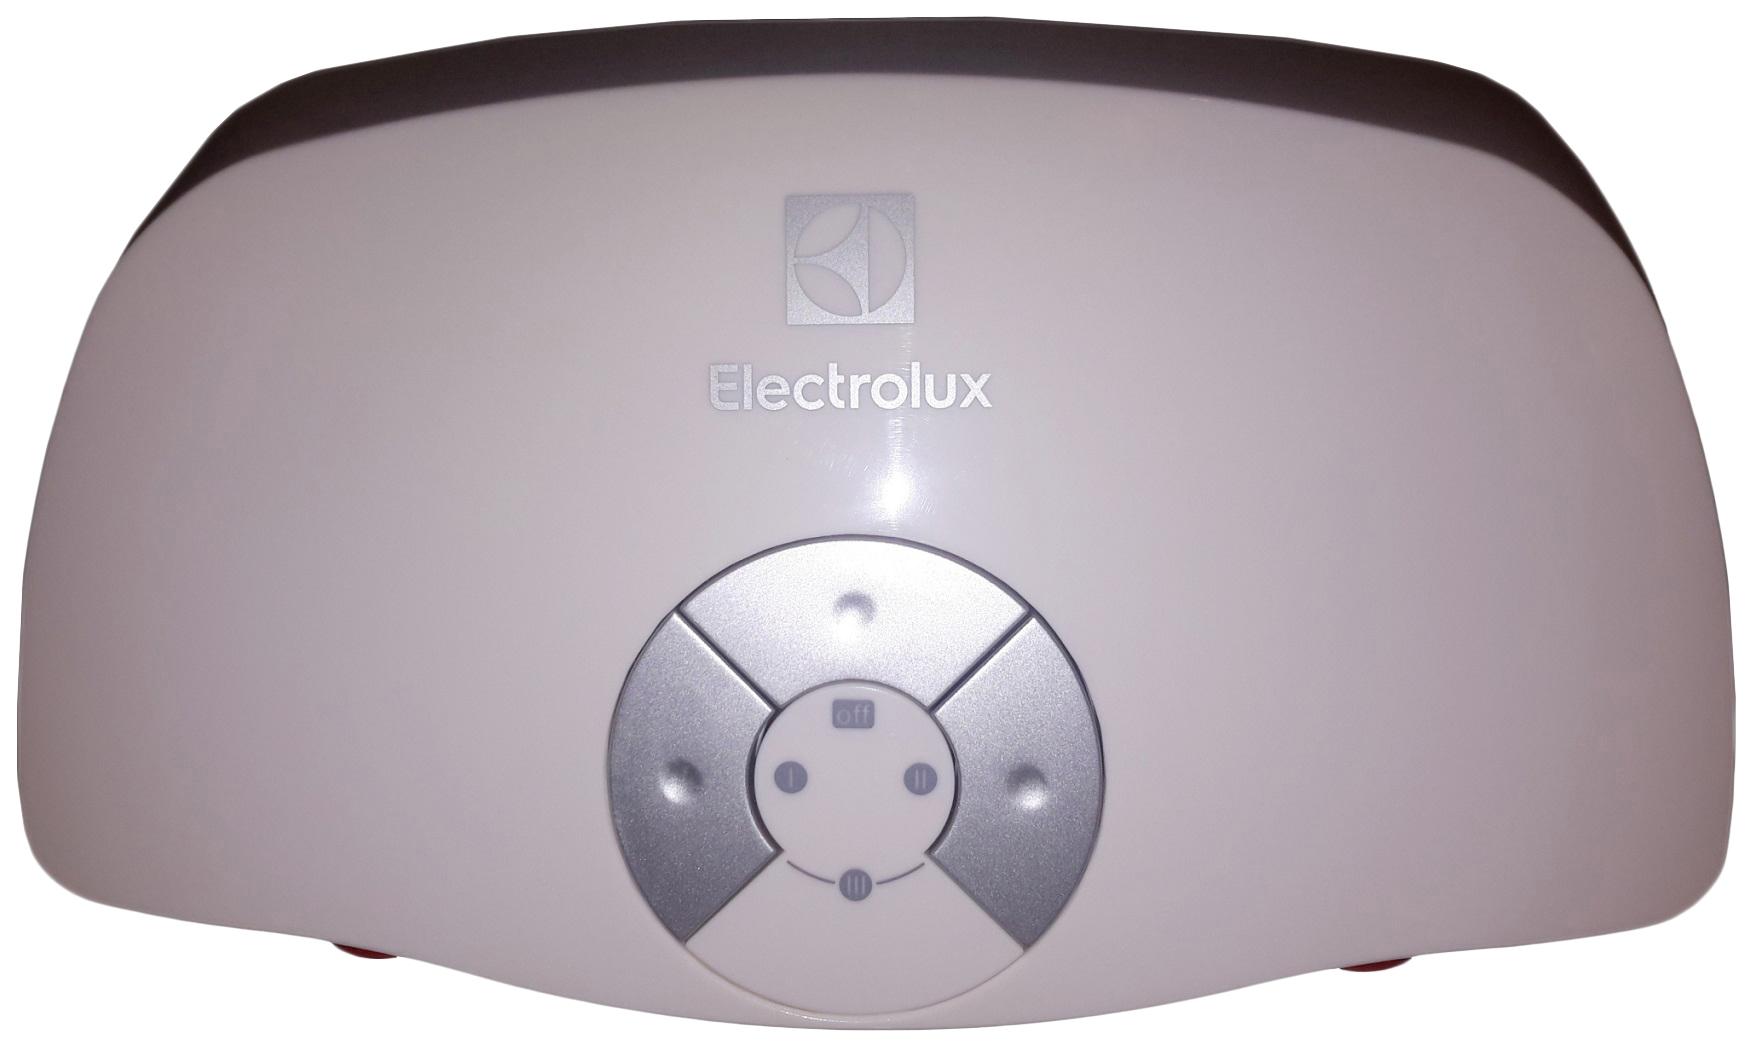 ELECTROLUX 2.0 T SMARTFIX 2.0